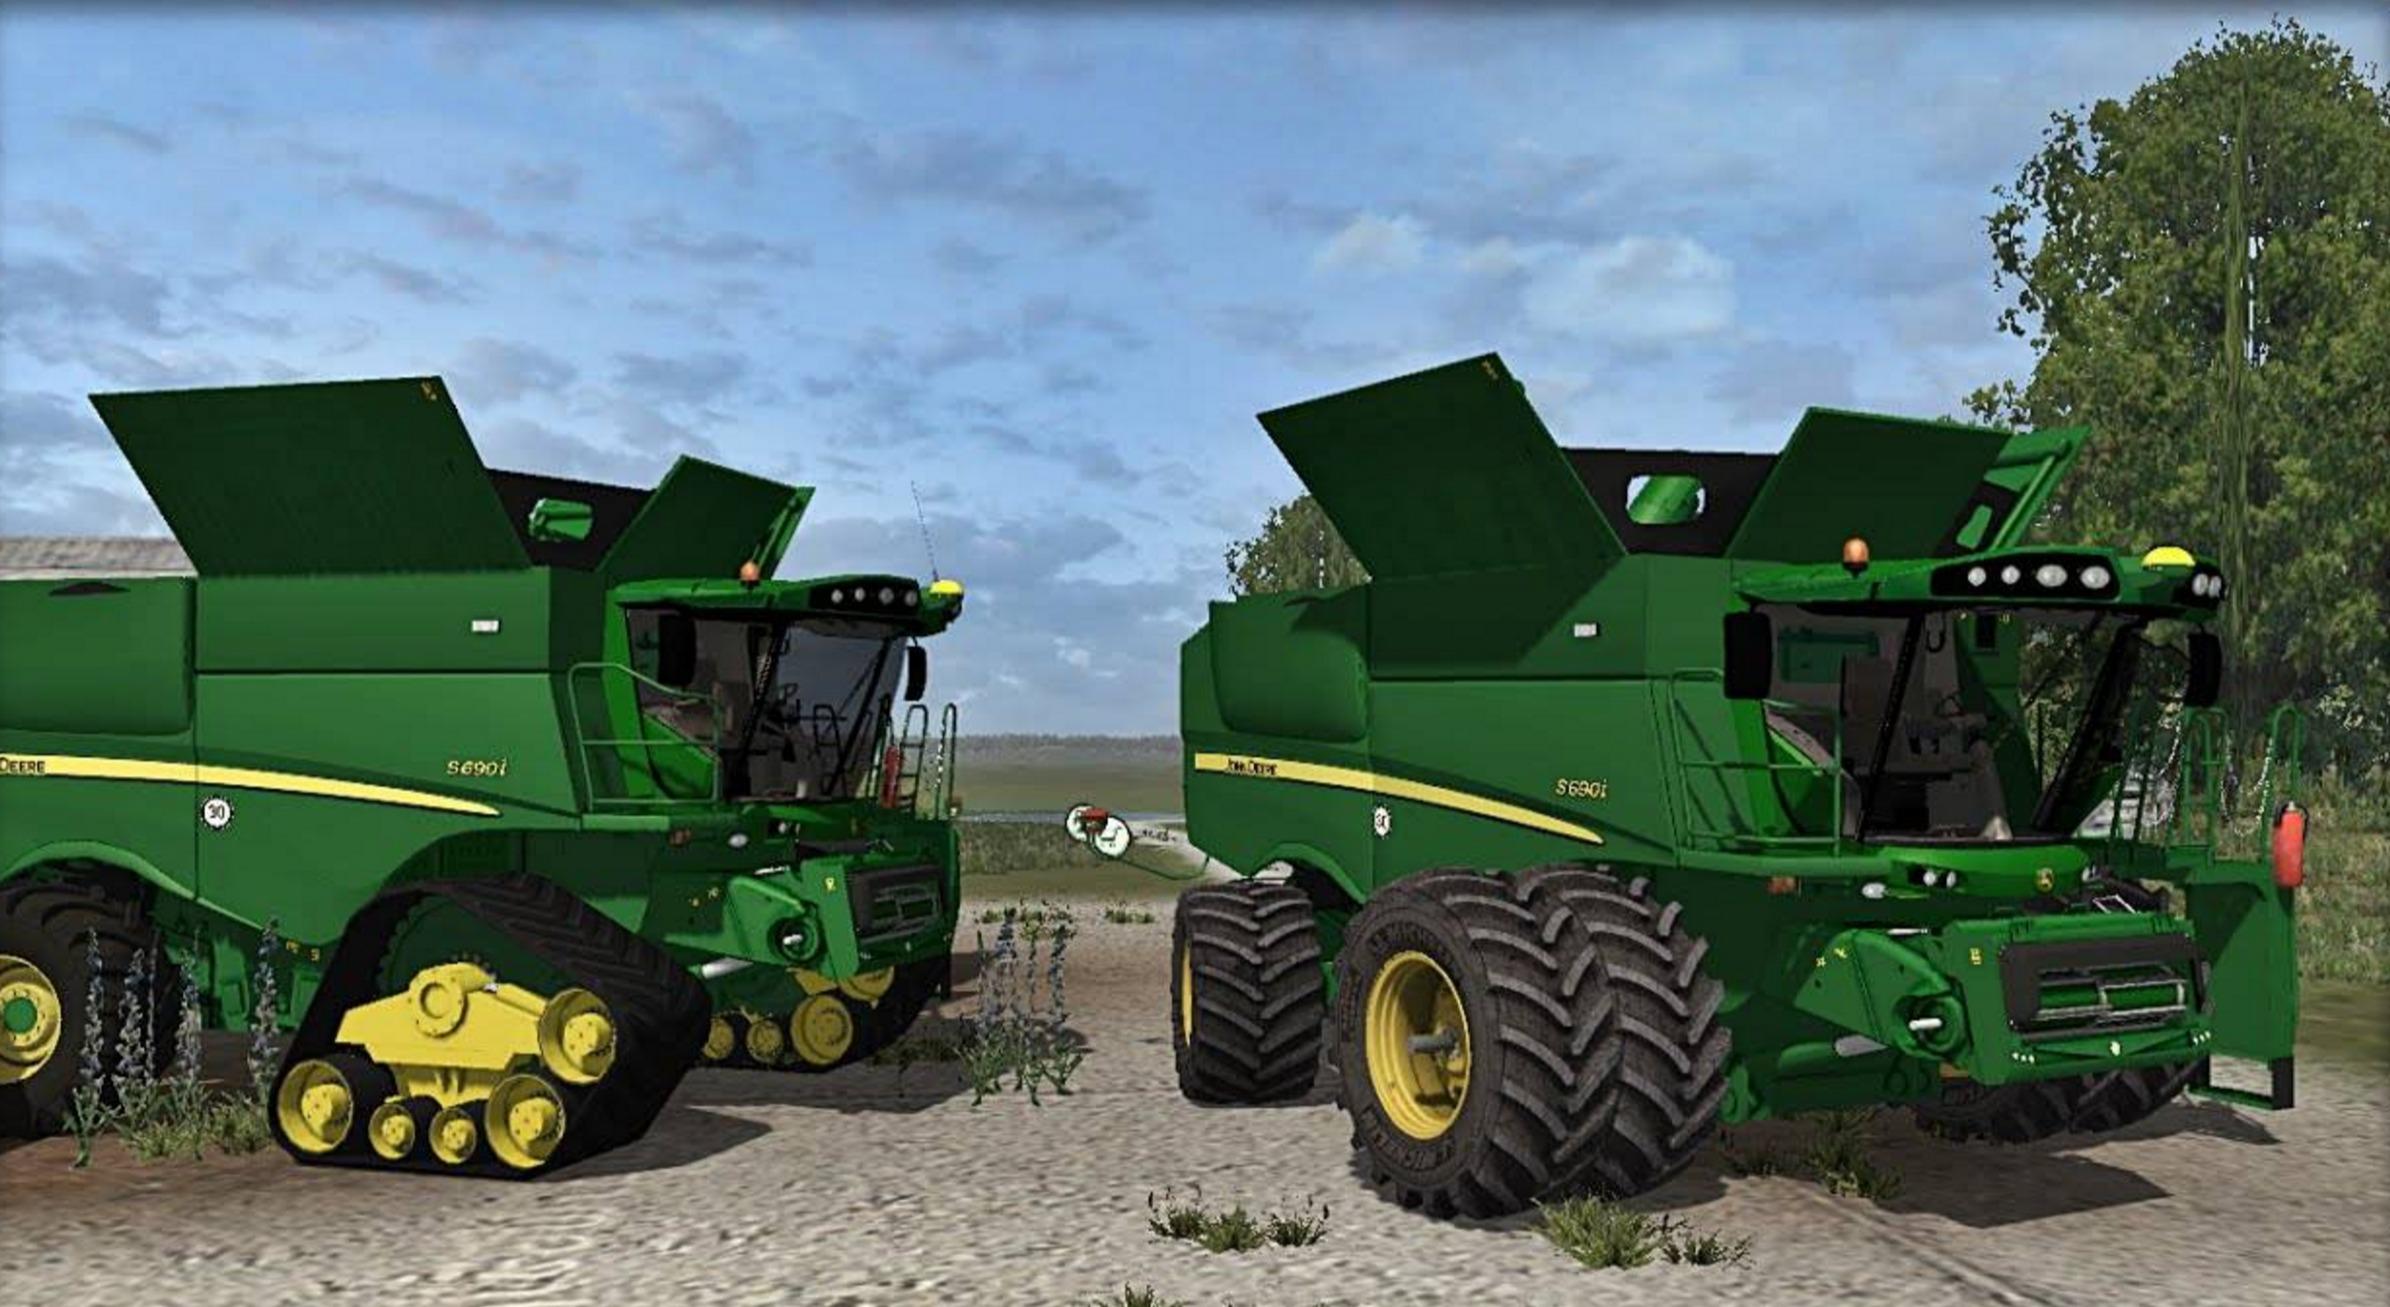 John Deere s690i Combine - Farming simulator 2017 / 2015 ...